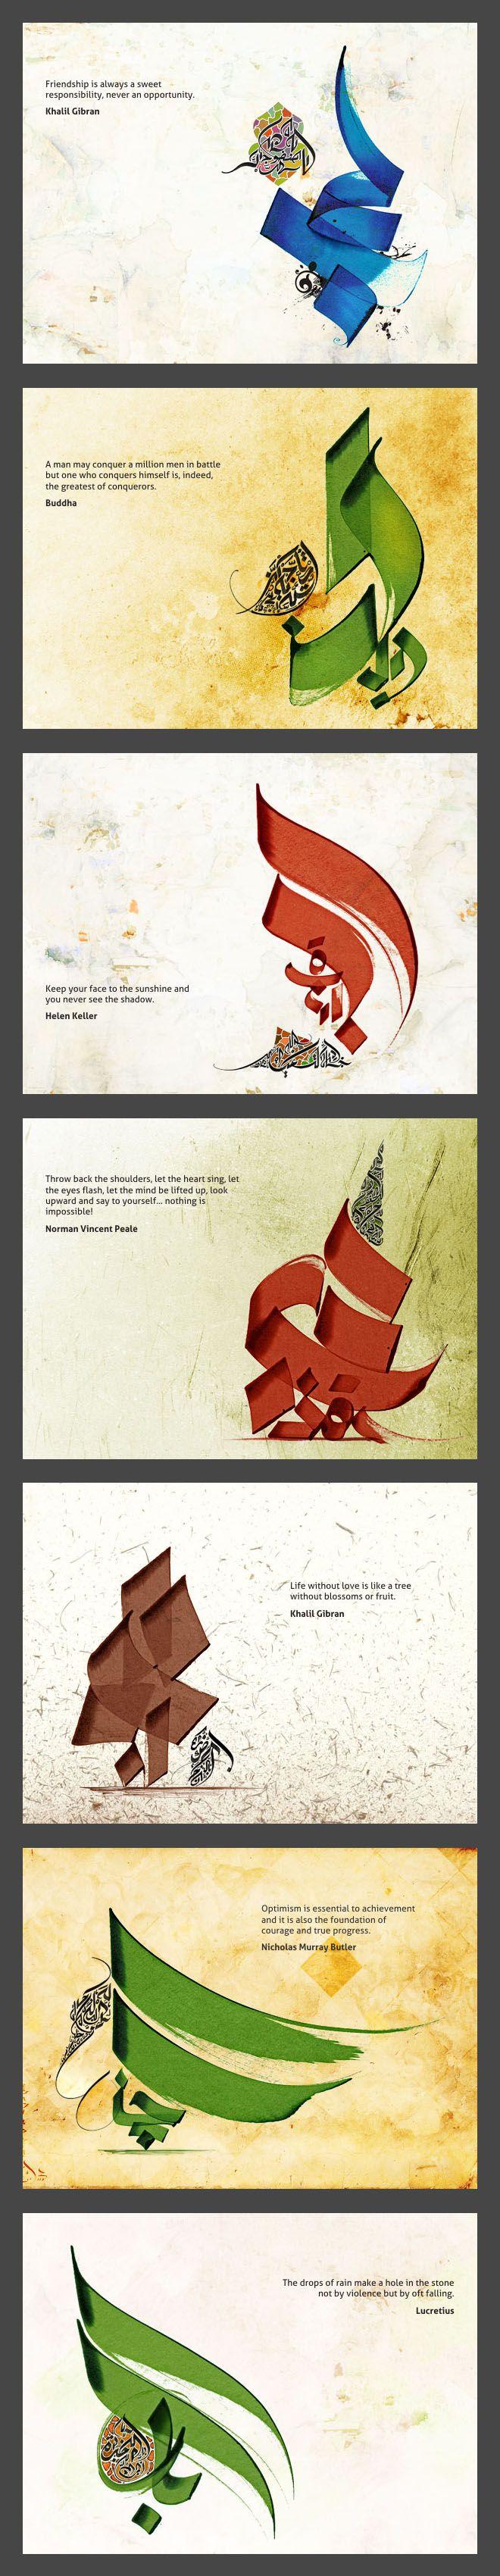 Arabic calligraphy project by khawarbilal.deviantart.com on @deviantART